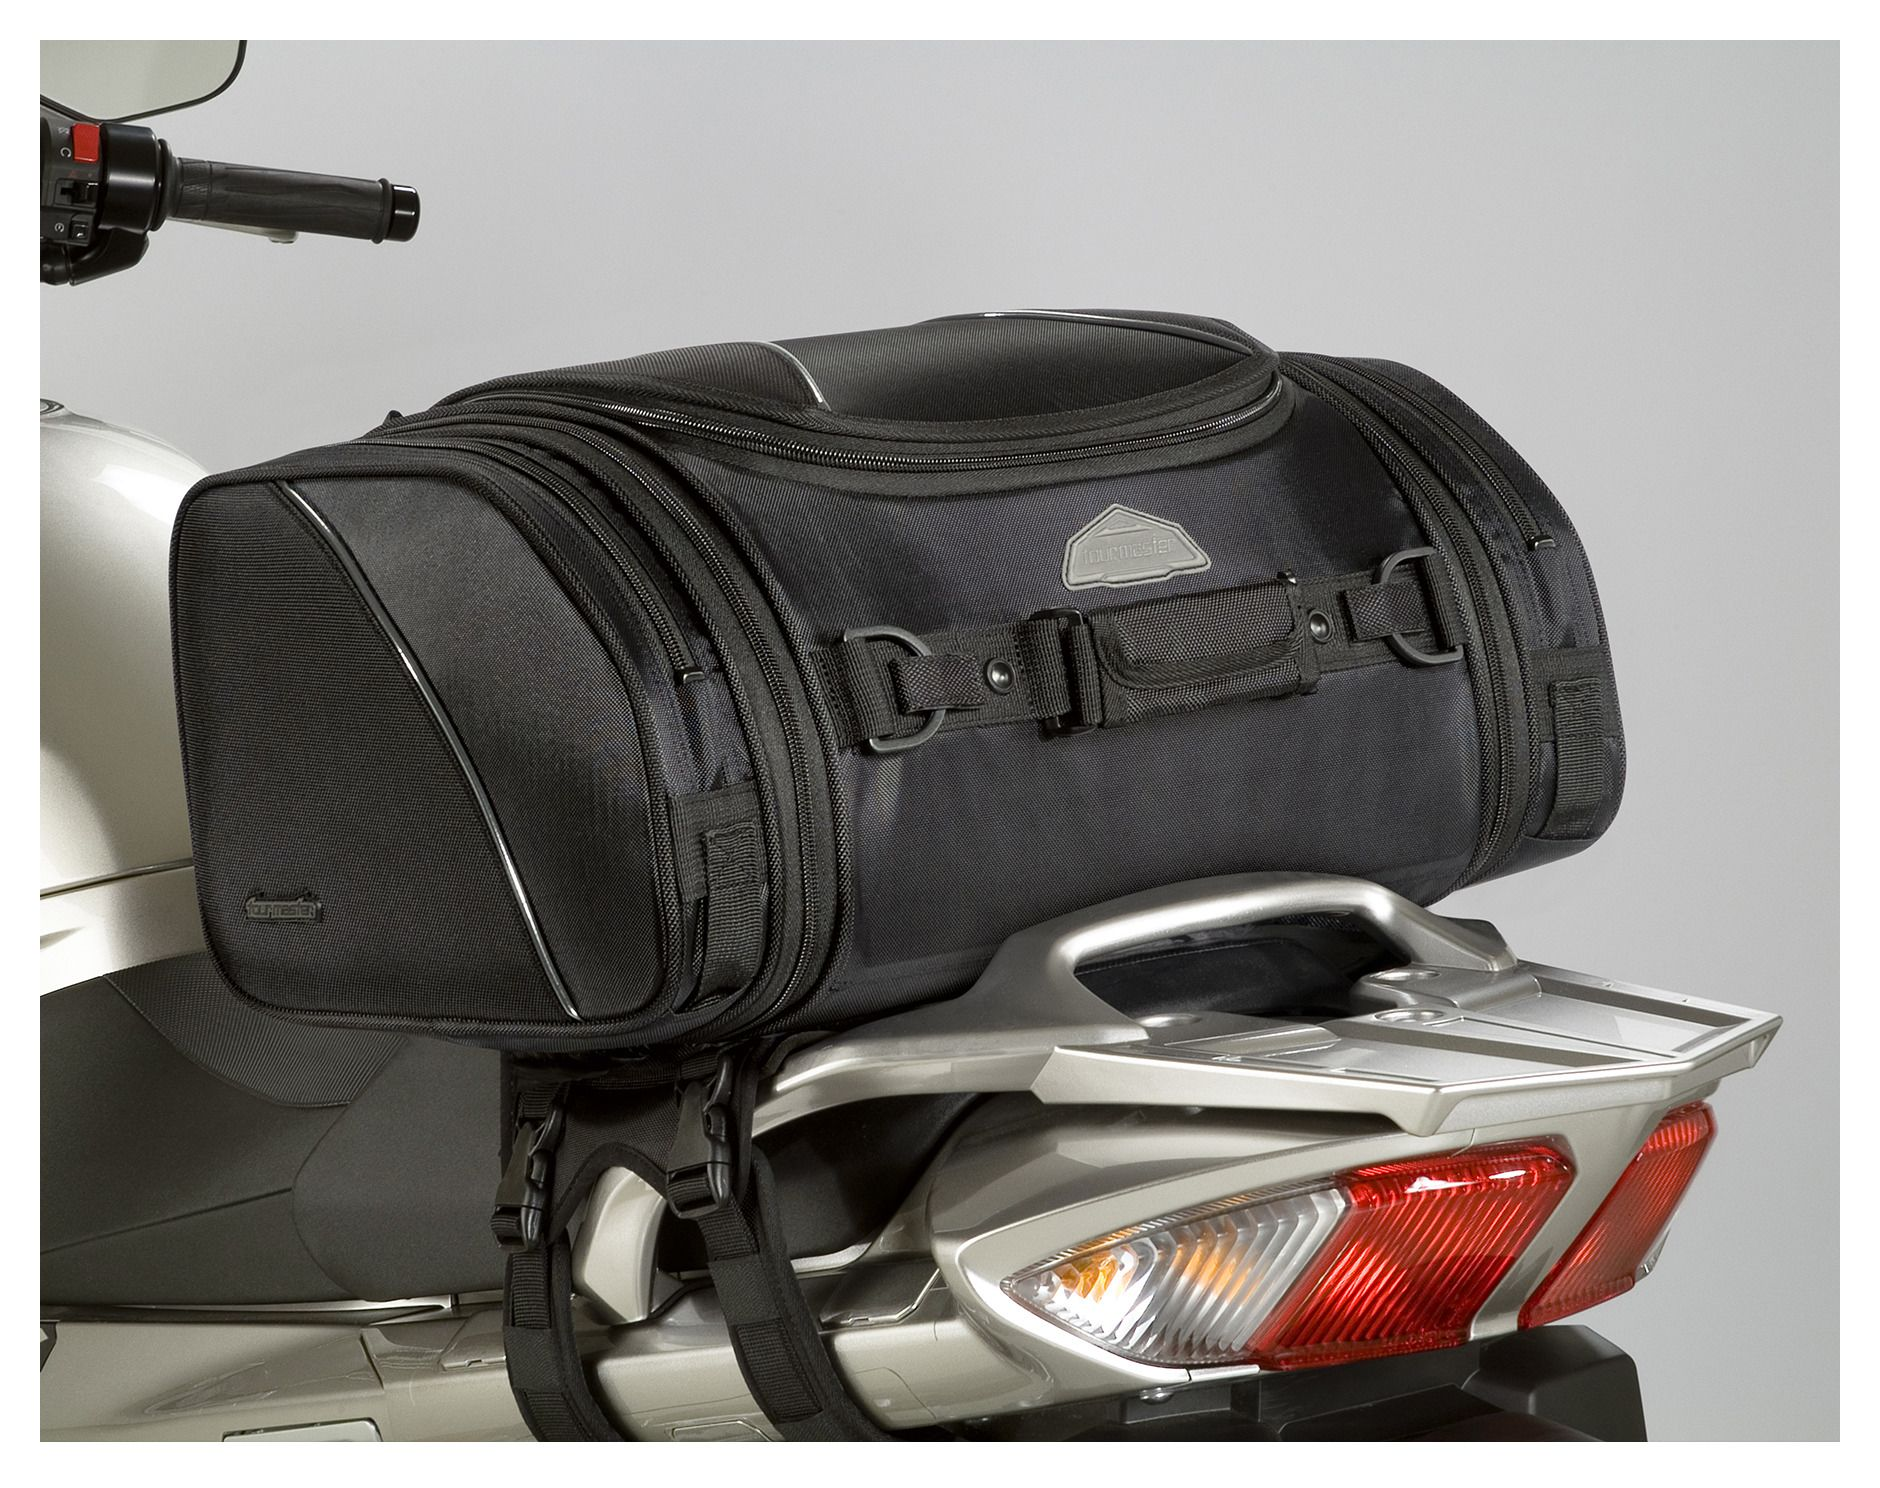 df719f8cc798 Tour Master Elite Tail Bag - RevZilla